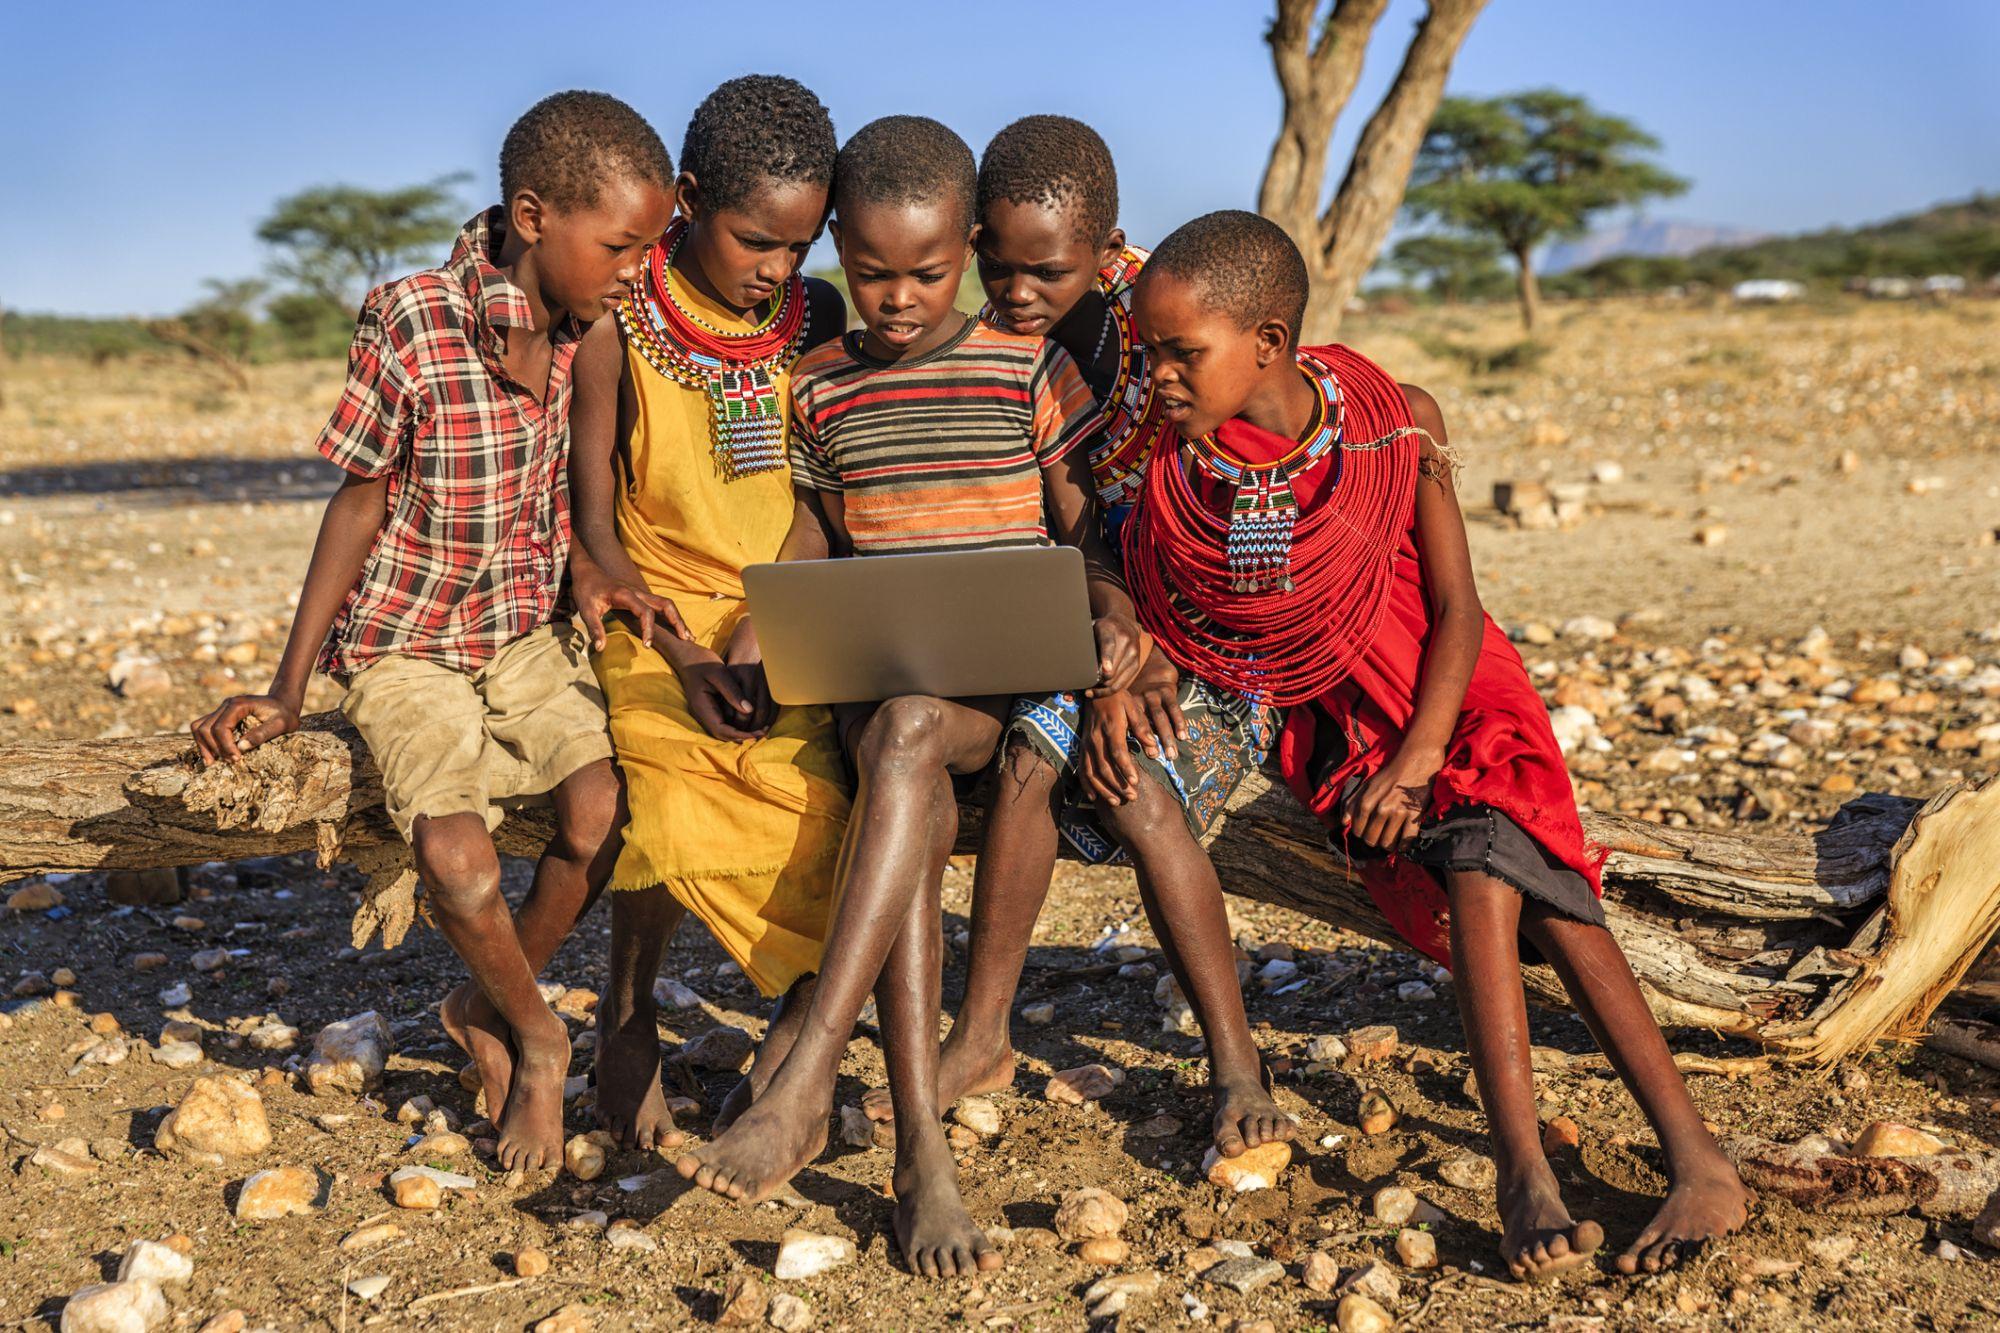 Can Entrepreneurs Disrupt Worldwide Social and Environmental Problems?